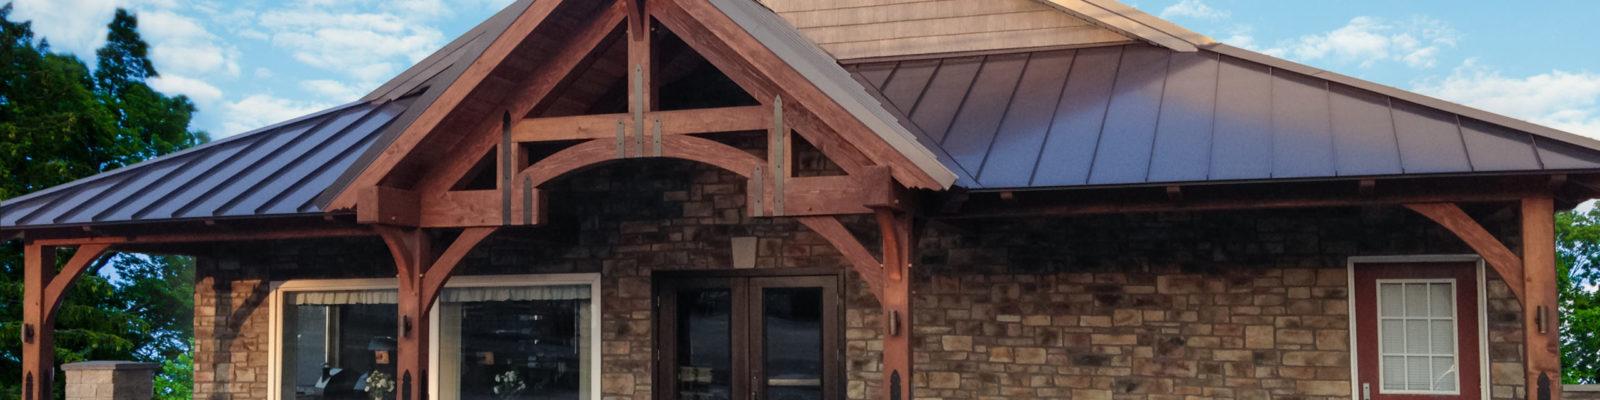 Sauders New Timber Frame Storefront